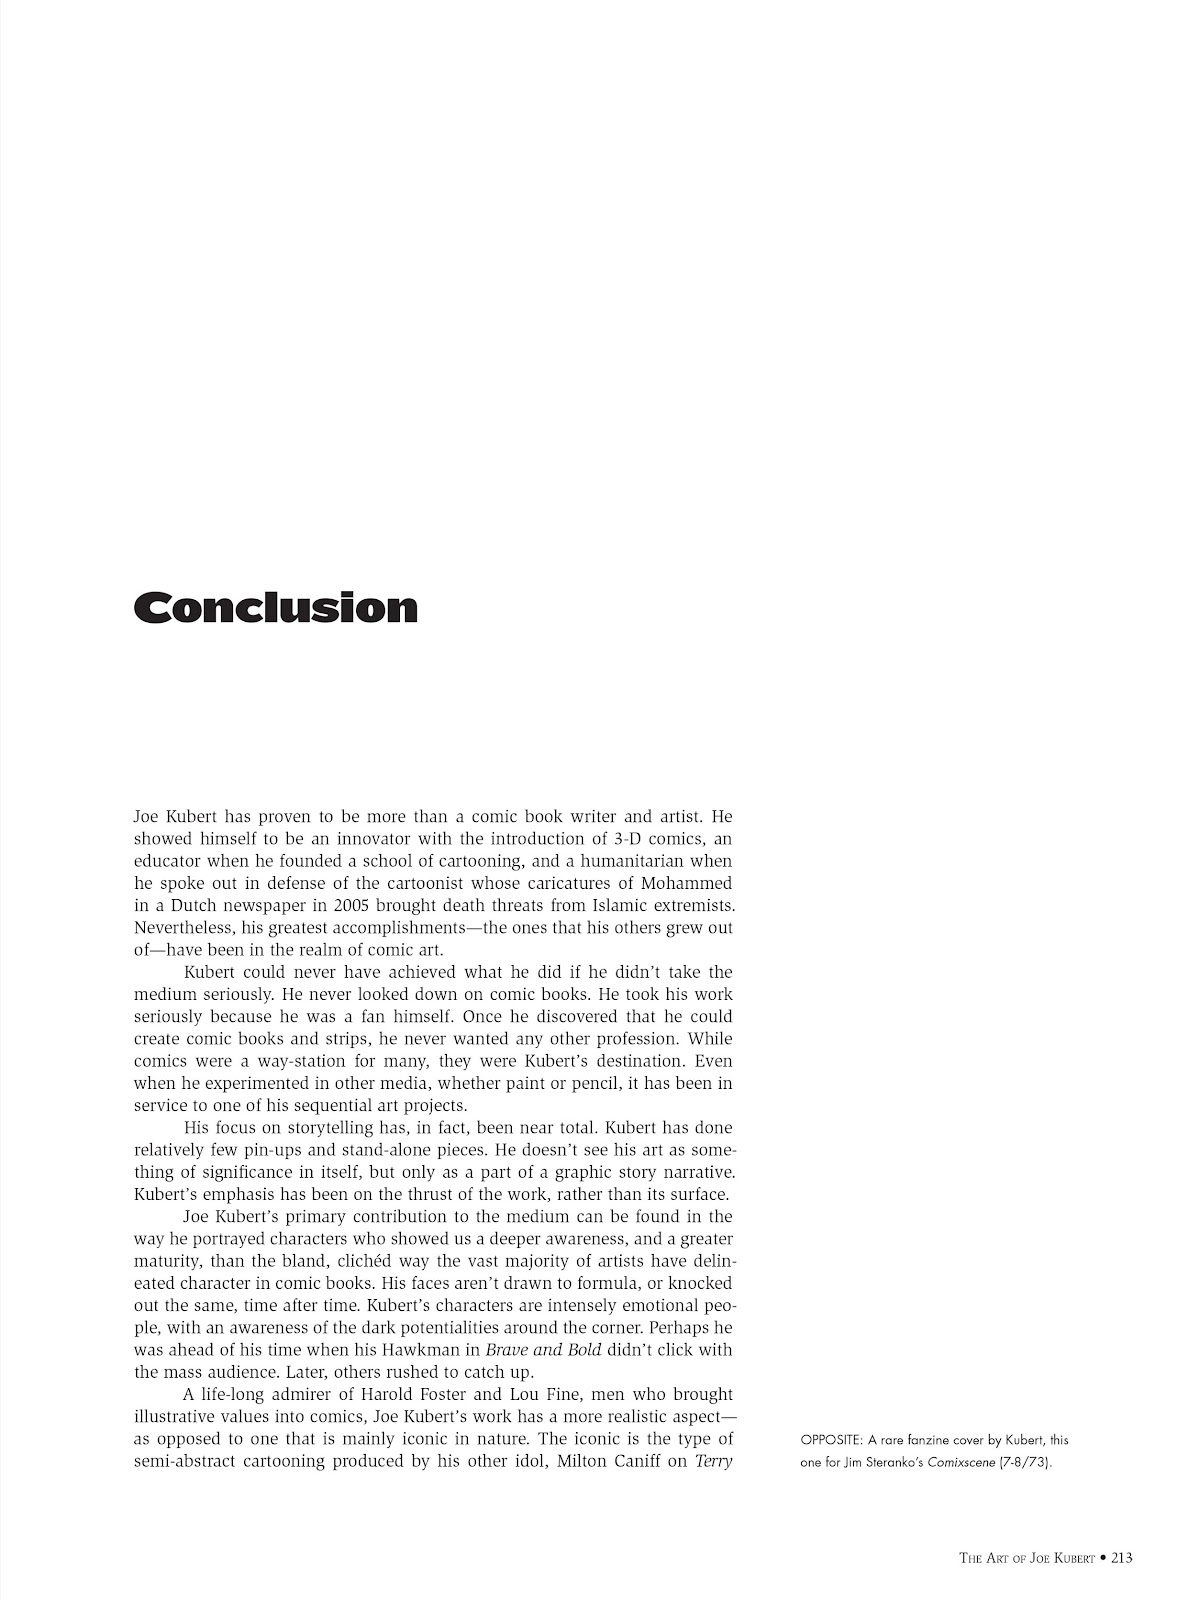 Read online The Art of Joe Kubert comic -  Issue # TPB (Part 3) - 13